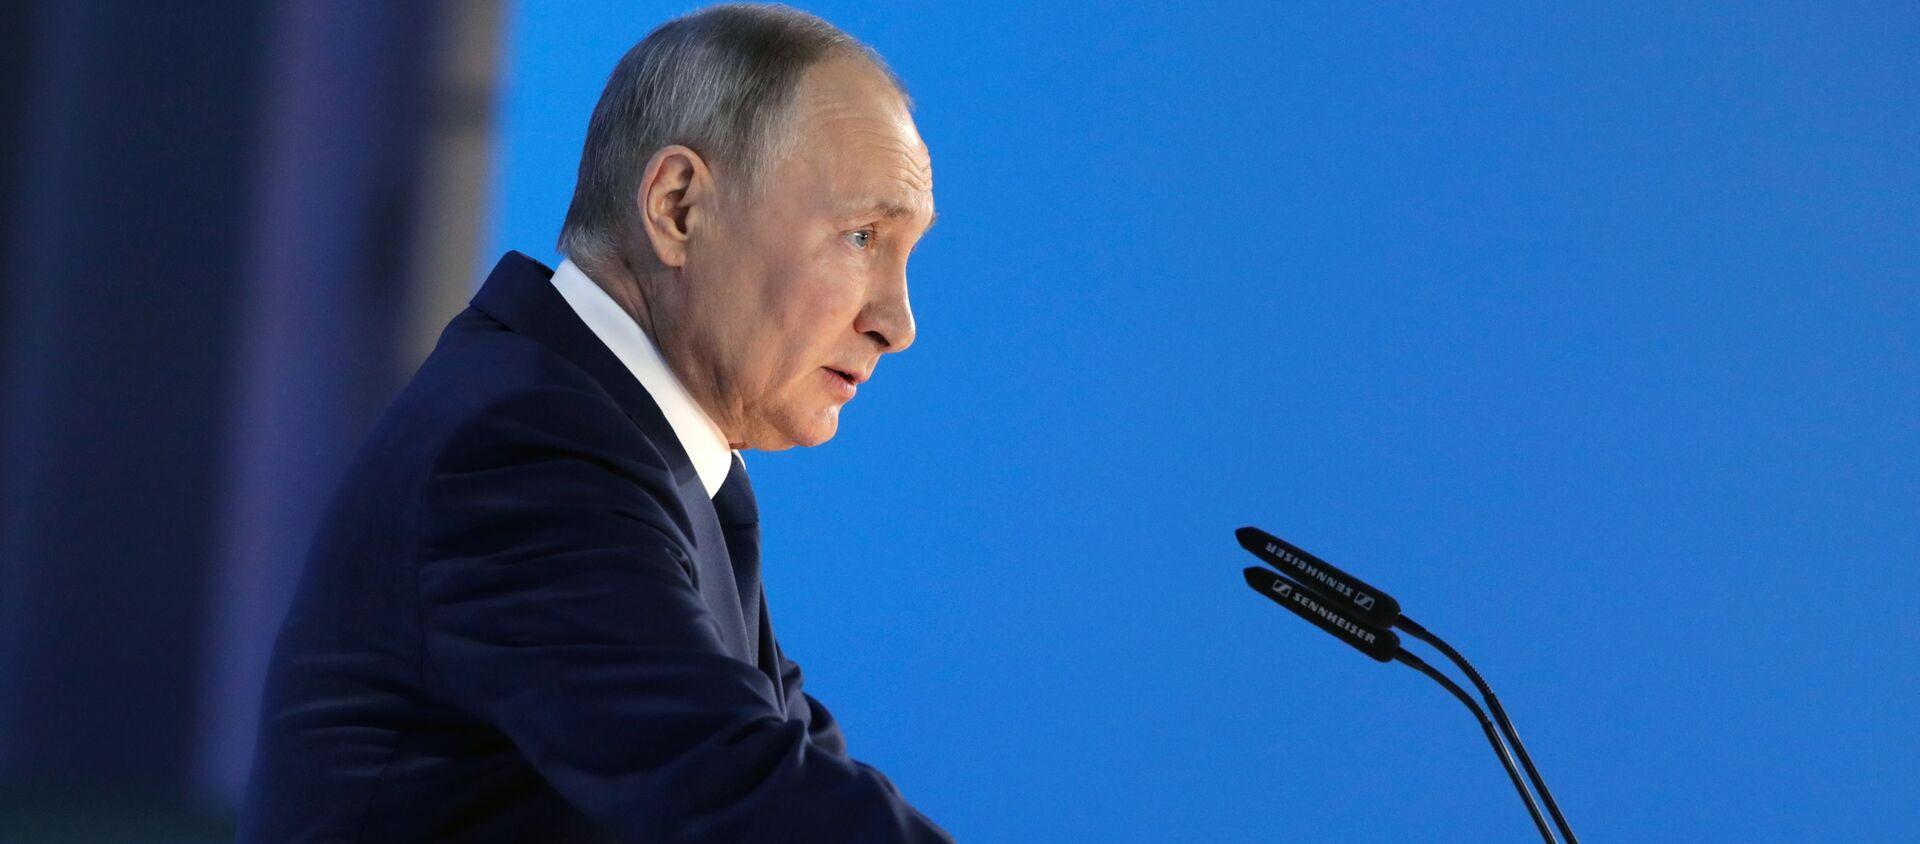 Президент РФ Владимир Путин - Sputnik Грузия, 1920, 21.04.2021